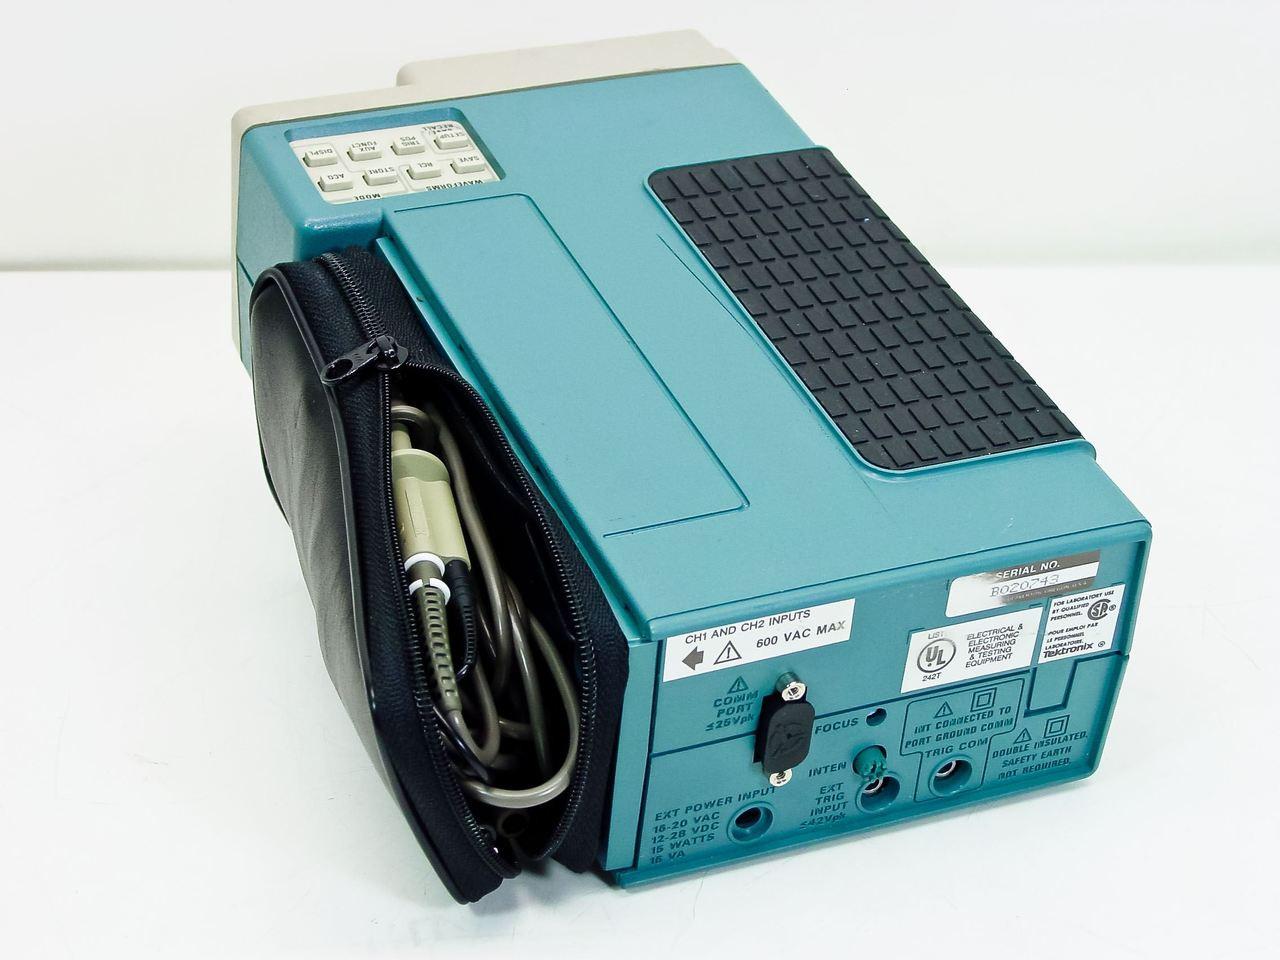 tektronix 224 60mhz digital storage oscilloscope handheld rh recycledgoods com tektronix tds 224 user manual tektronix 2224 manual